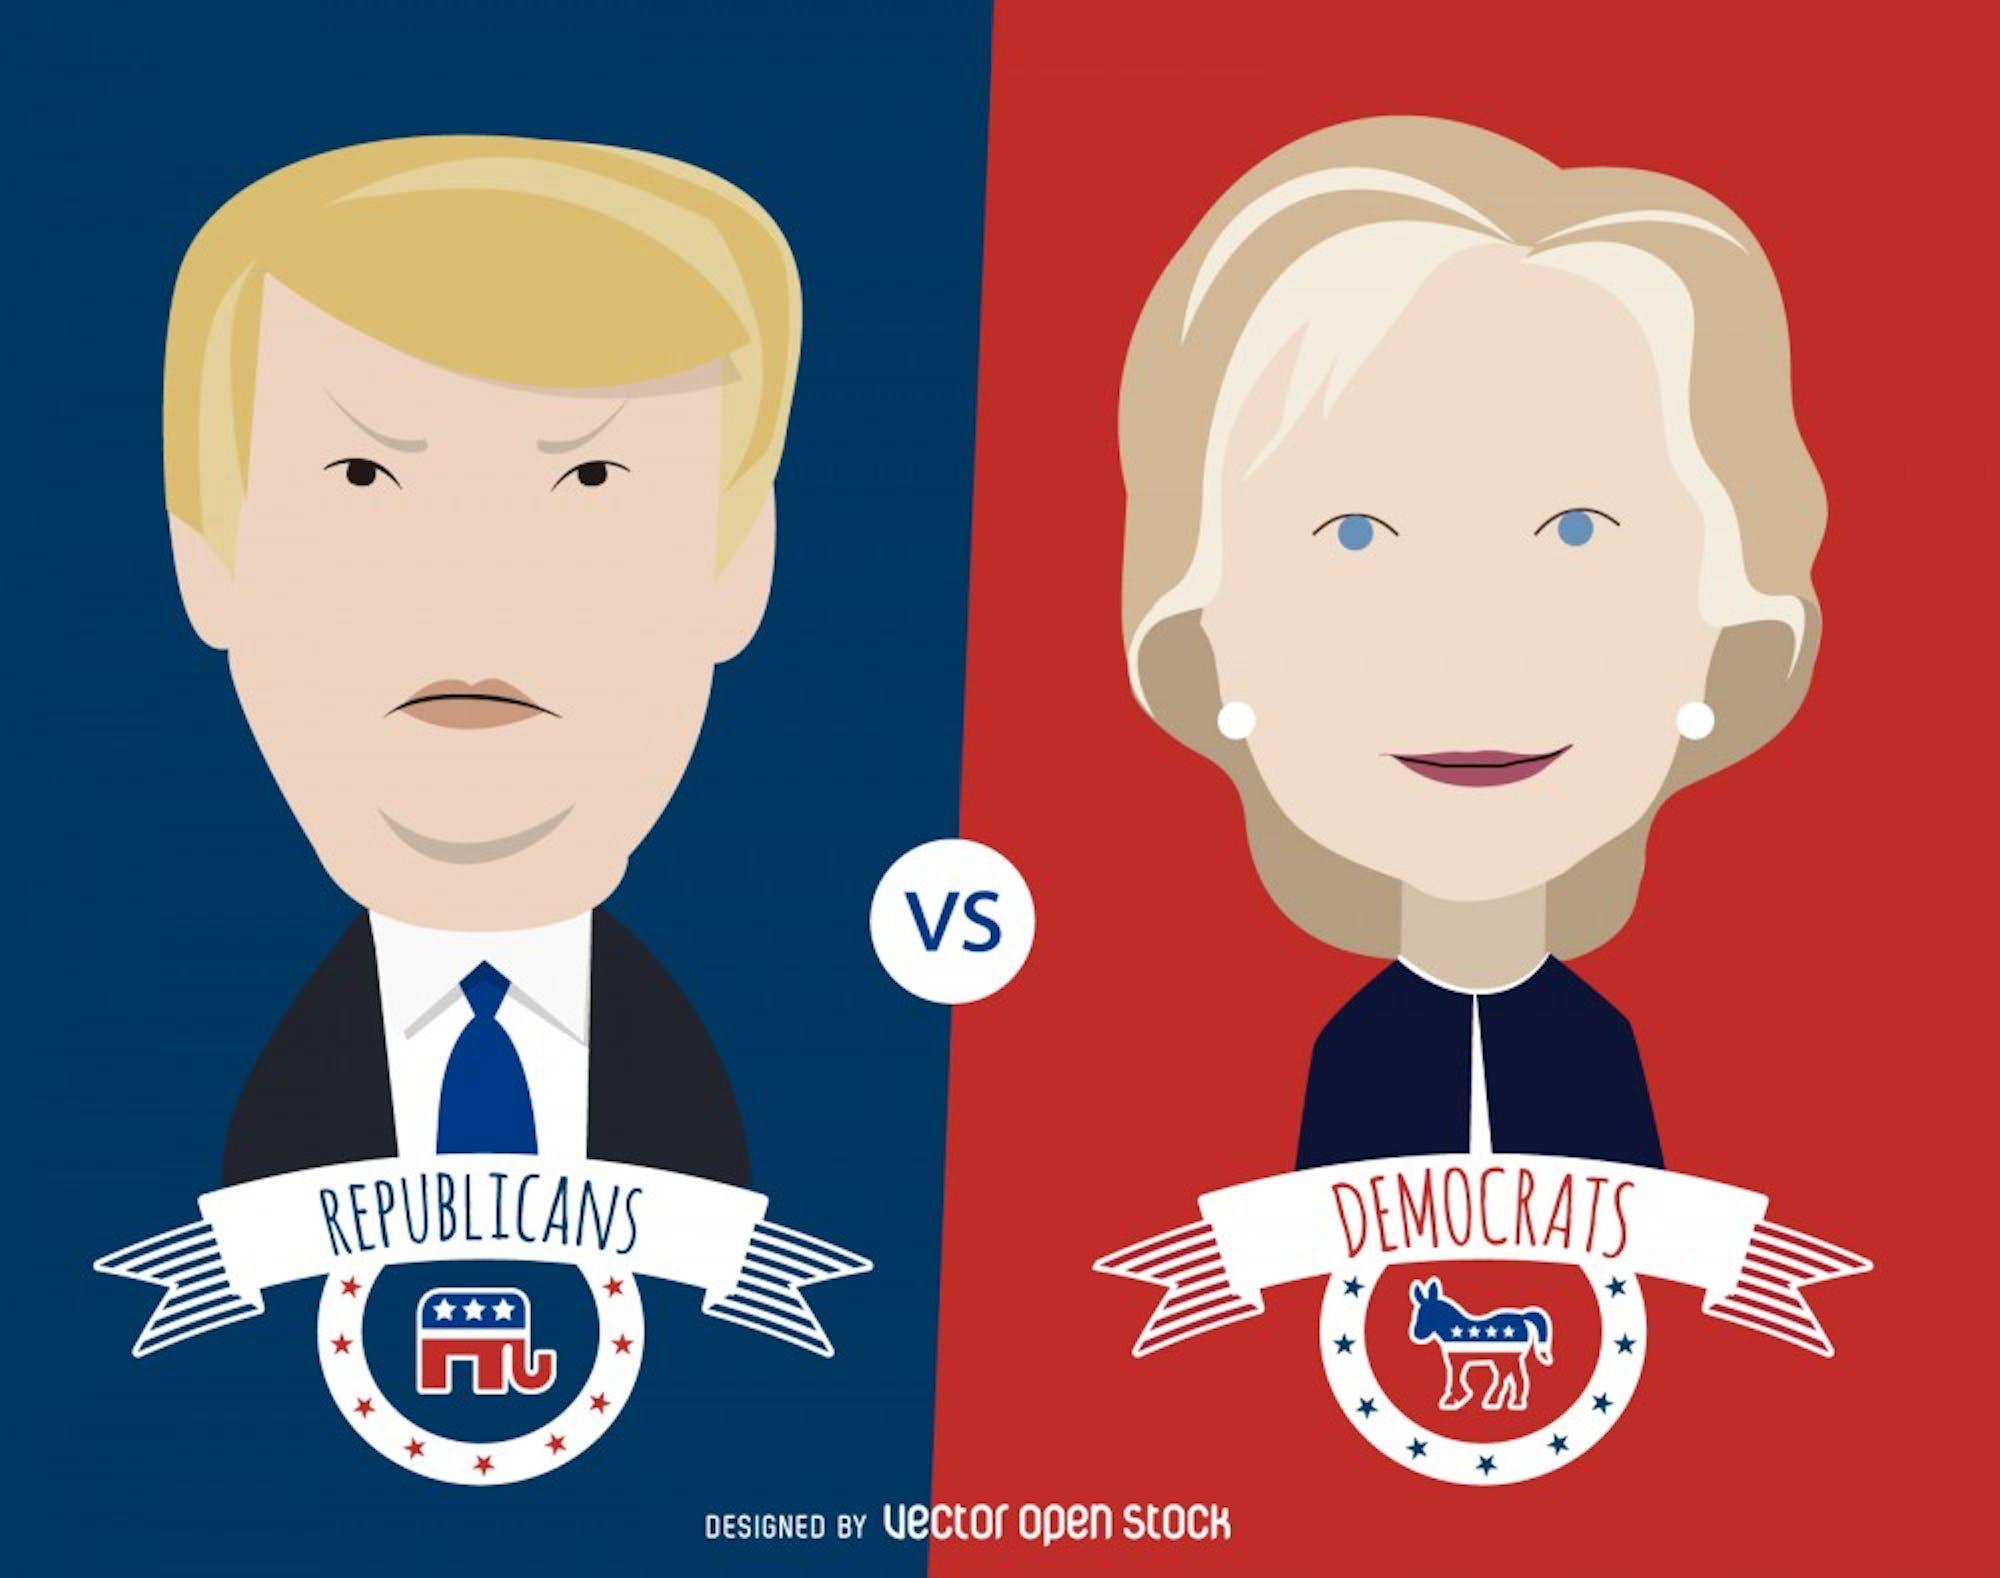 clinton_and_trump_cartoon_illustration